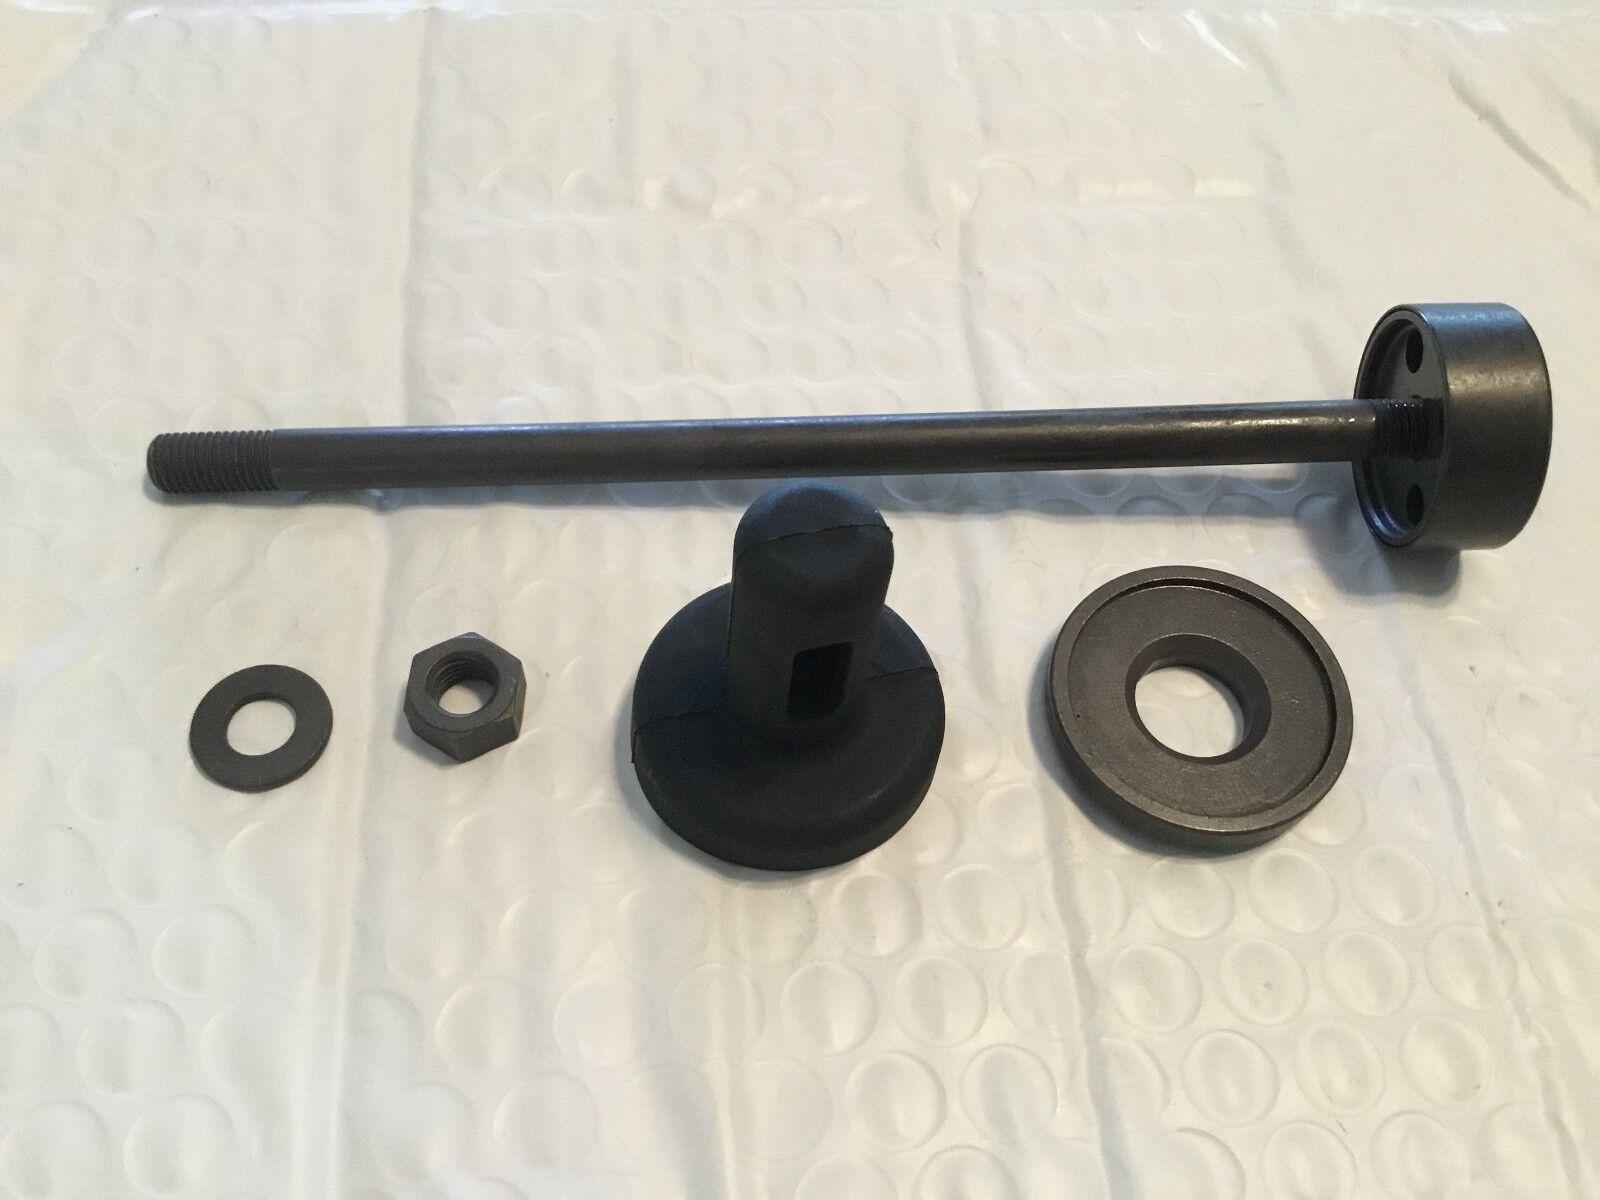 GM HVAC Blend Door Actuator Gear Rebuild kit fits many GM vehicles 1990-2013